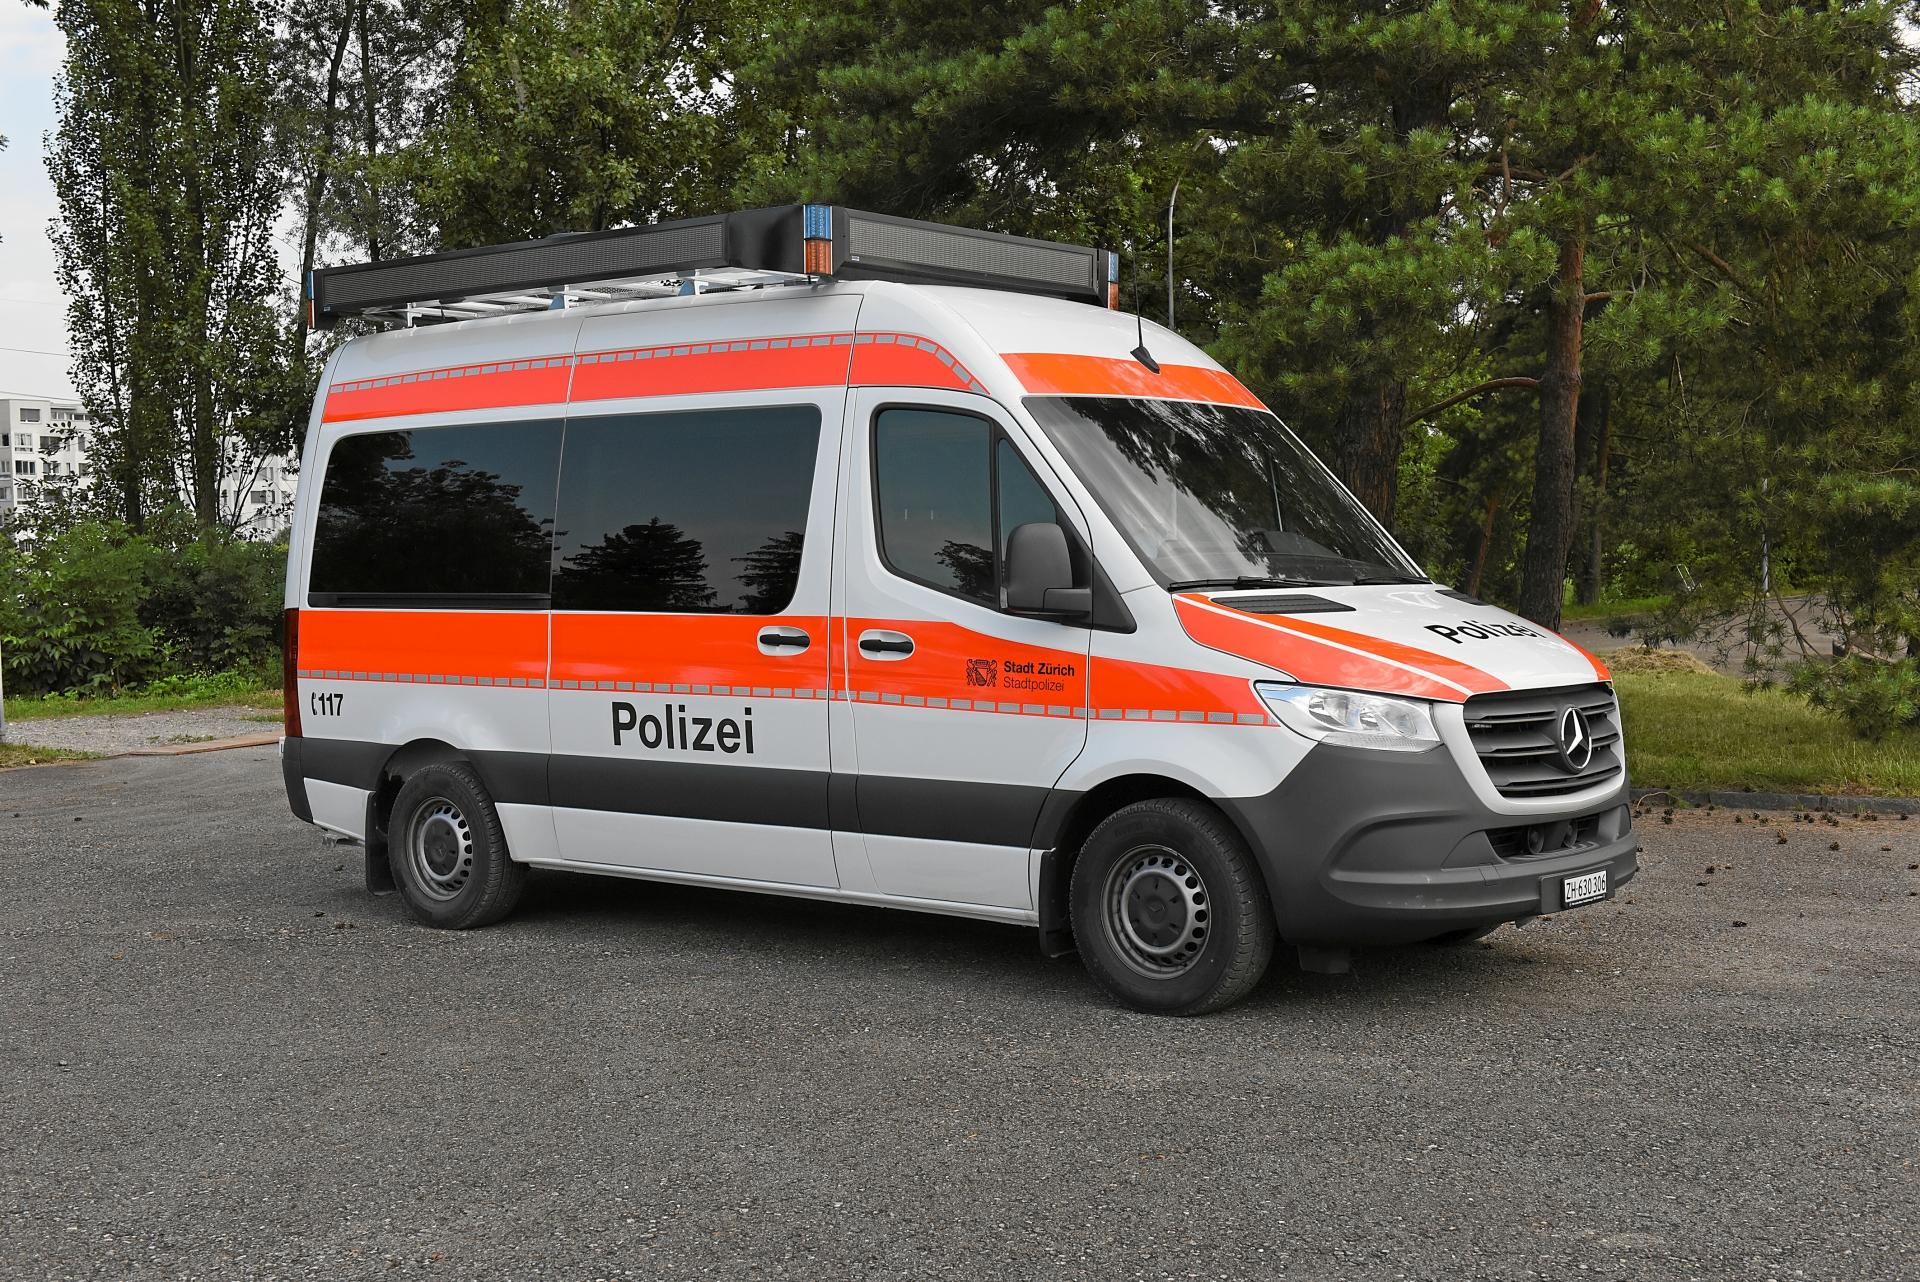 LaWa loudspeaker-vehicle 360° police Zurich